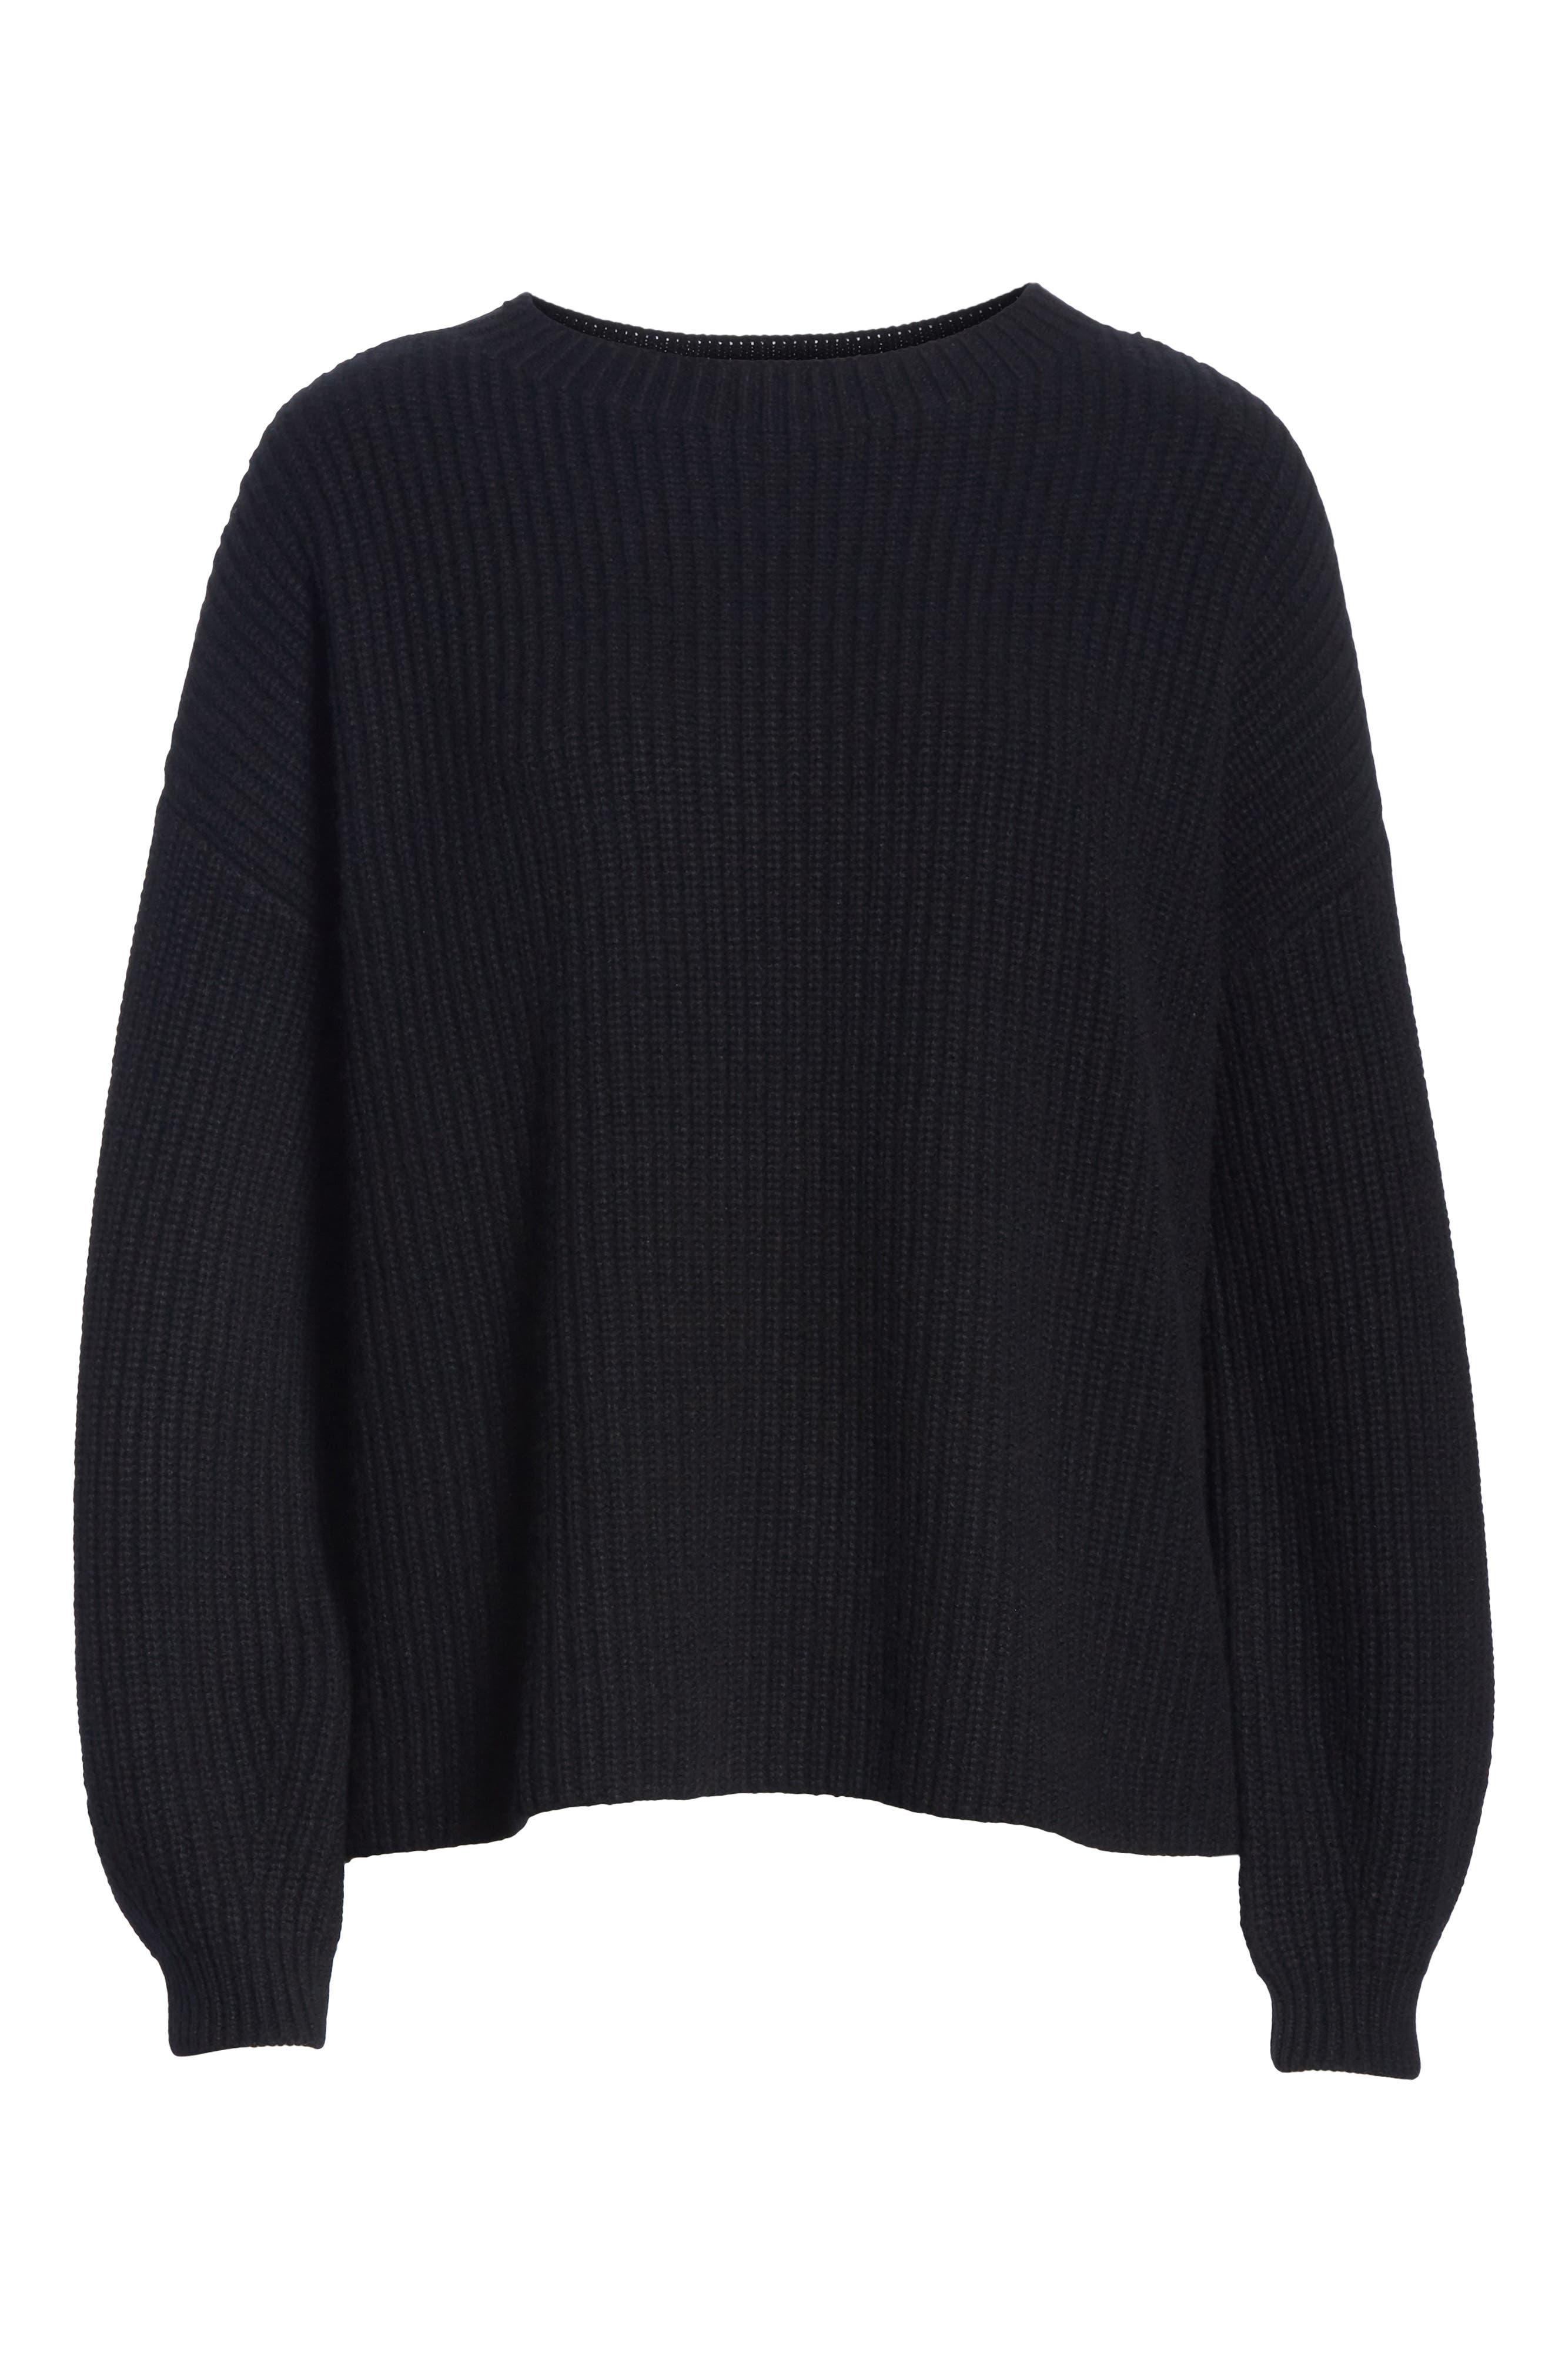 Crewneck Shaker Cashmere Sweater,                             Alternate thumbnail 6, color,                             BLACK